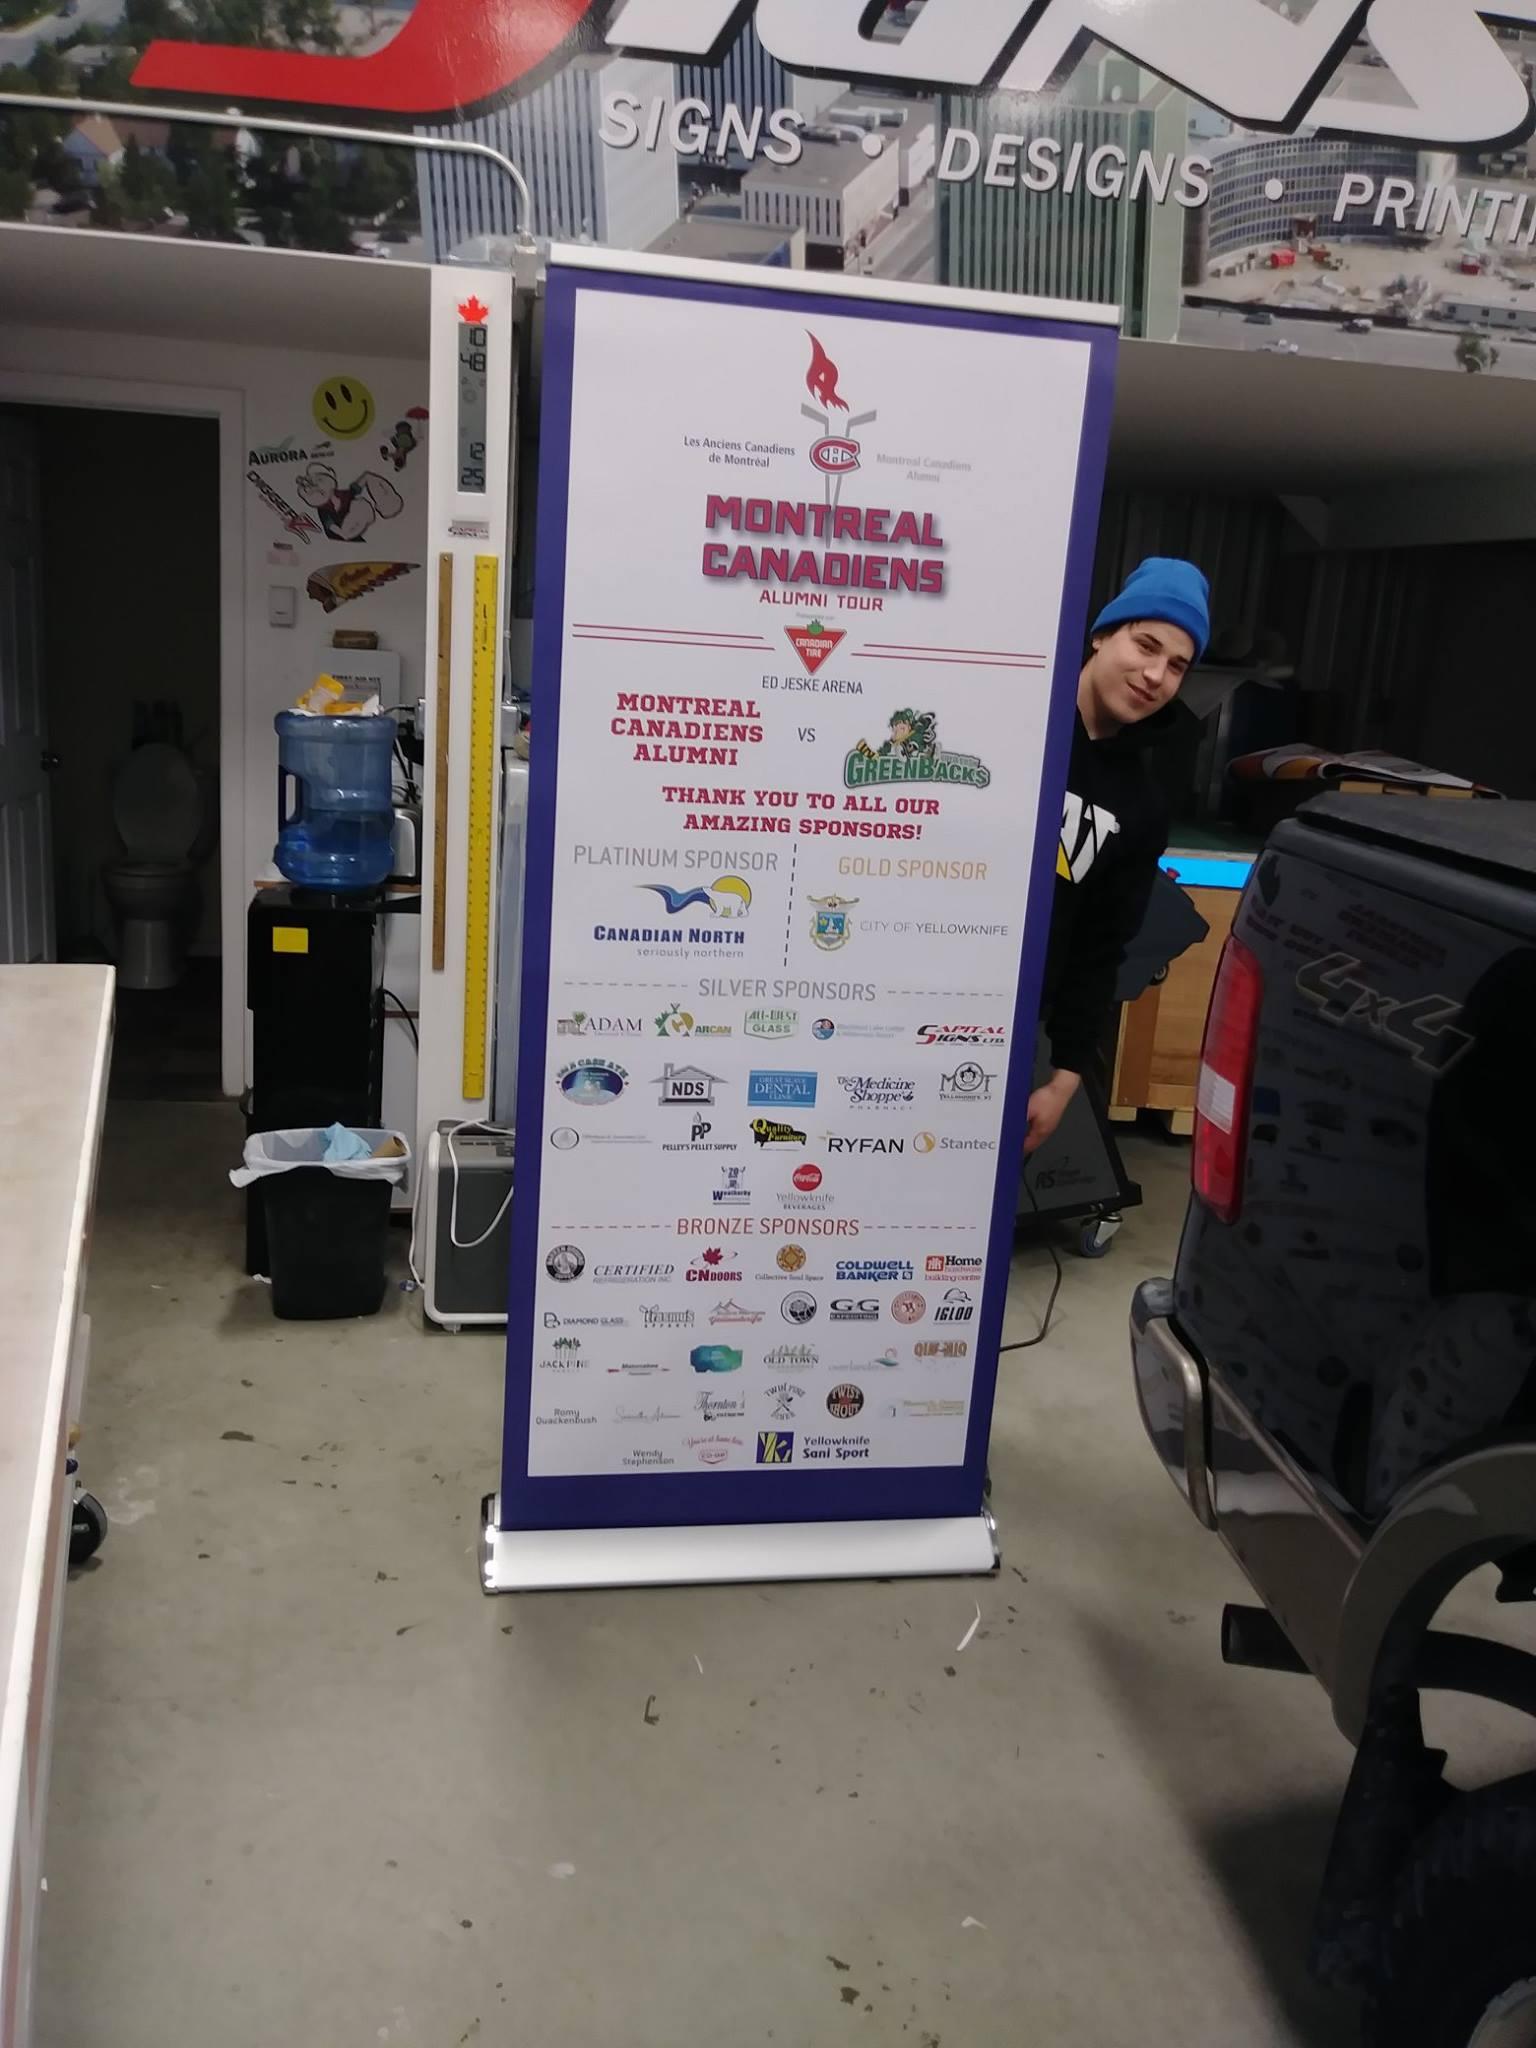 Montreal Canadiens Alumni Tour sponsorship banner.